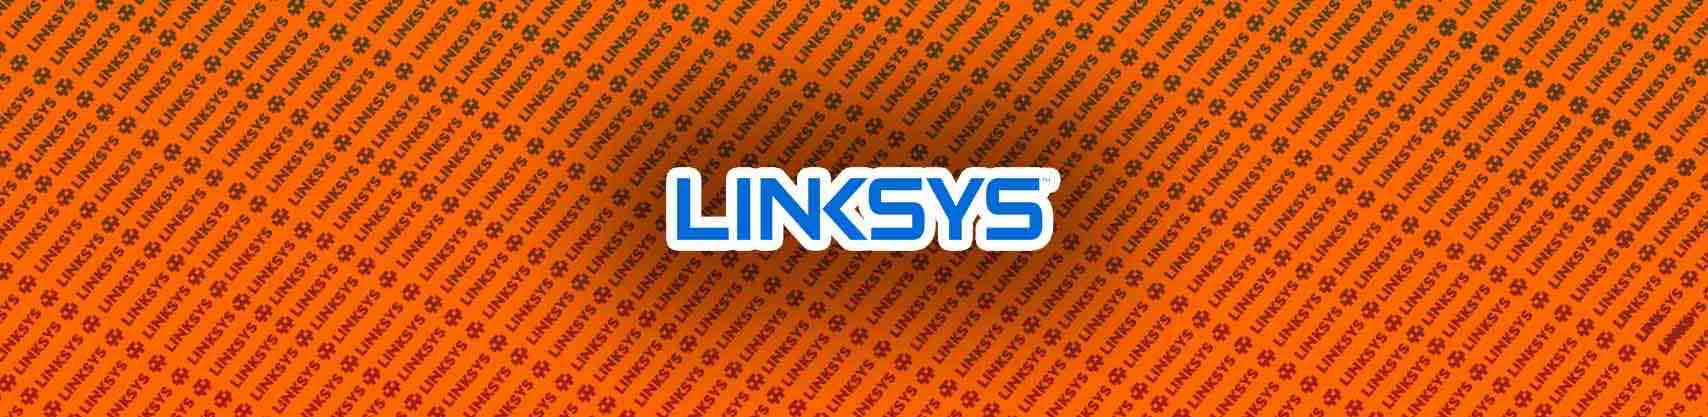 Linksys E2500 Manual